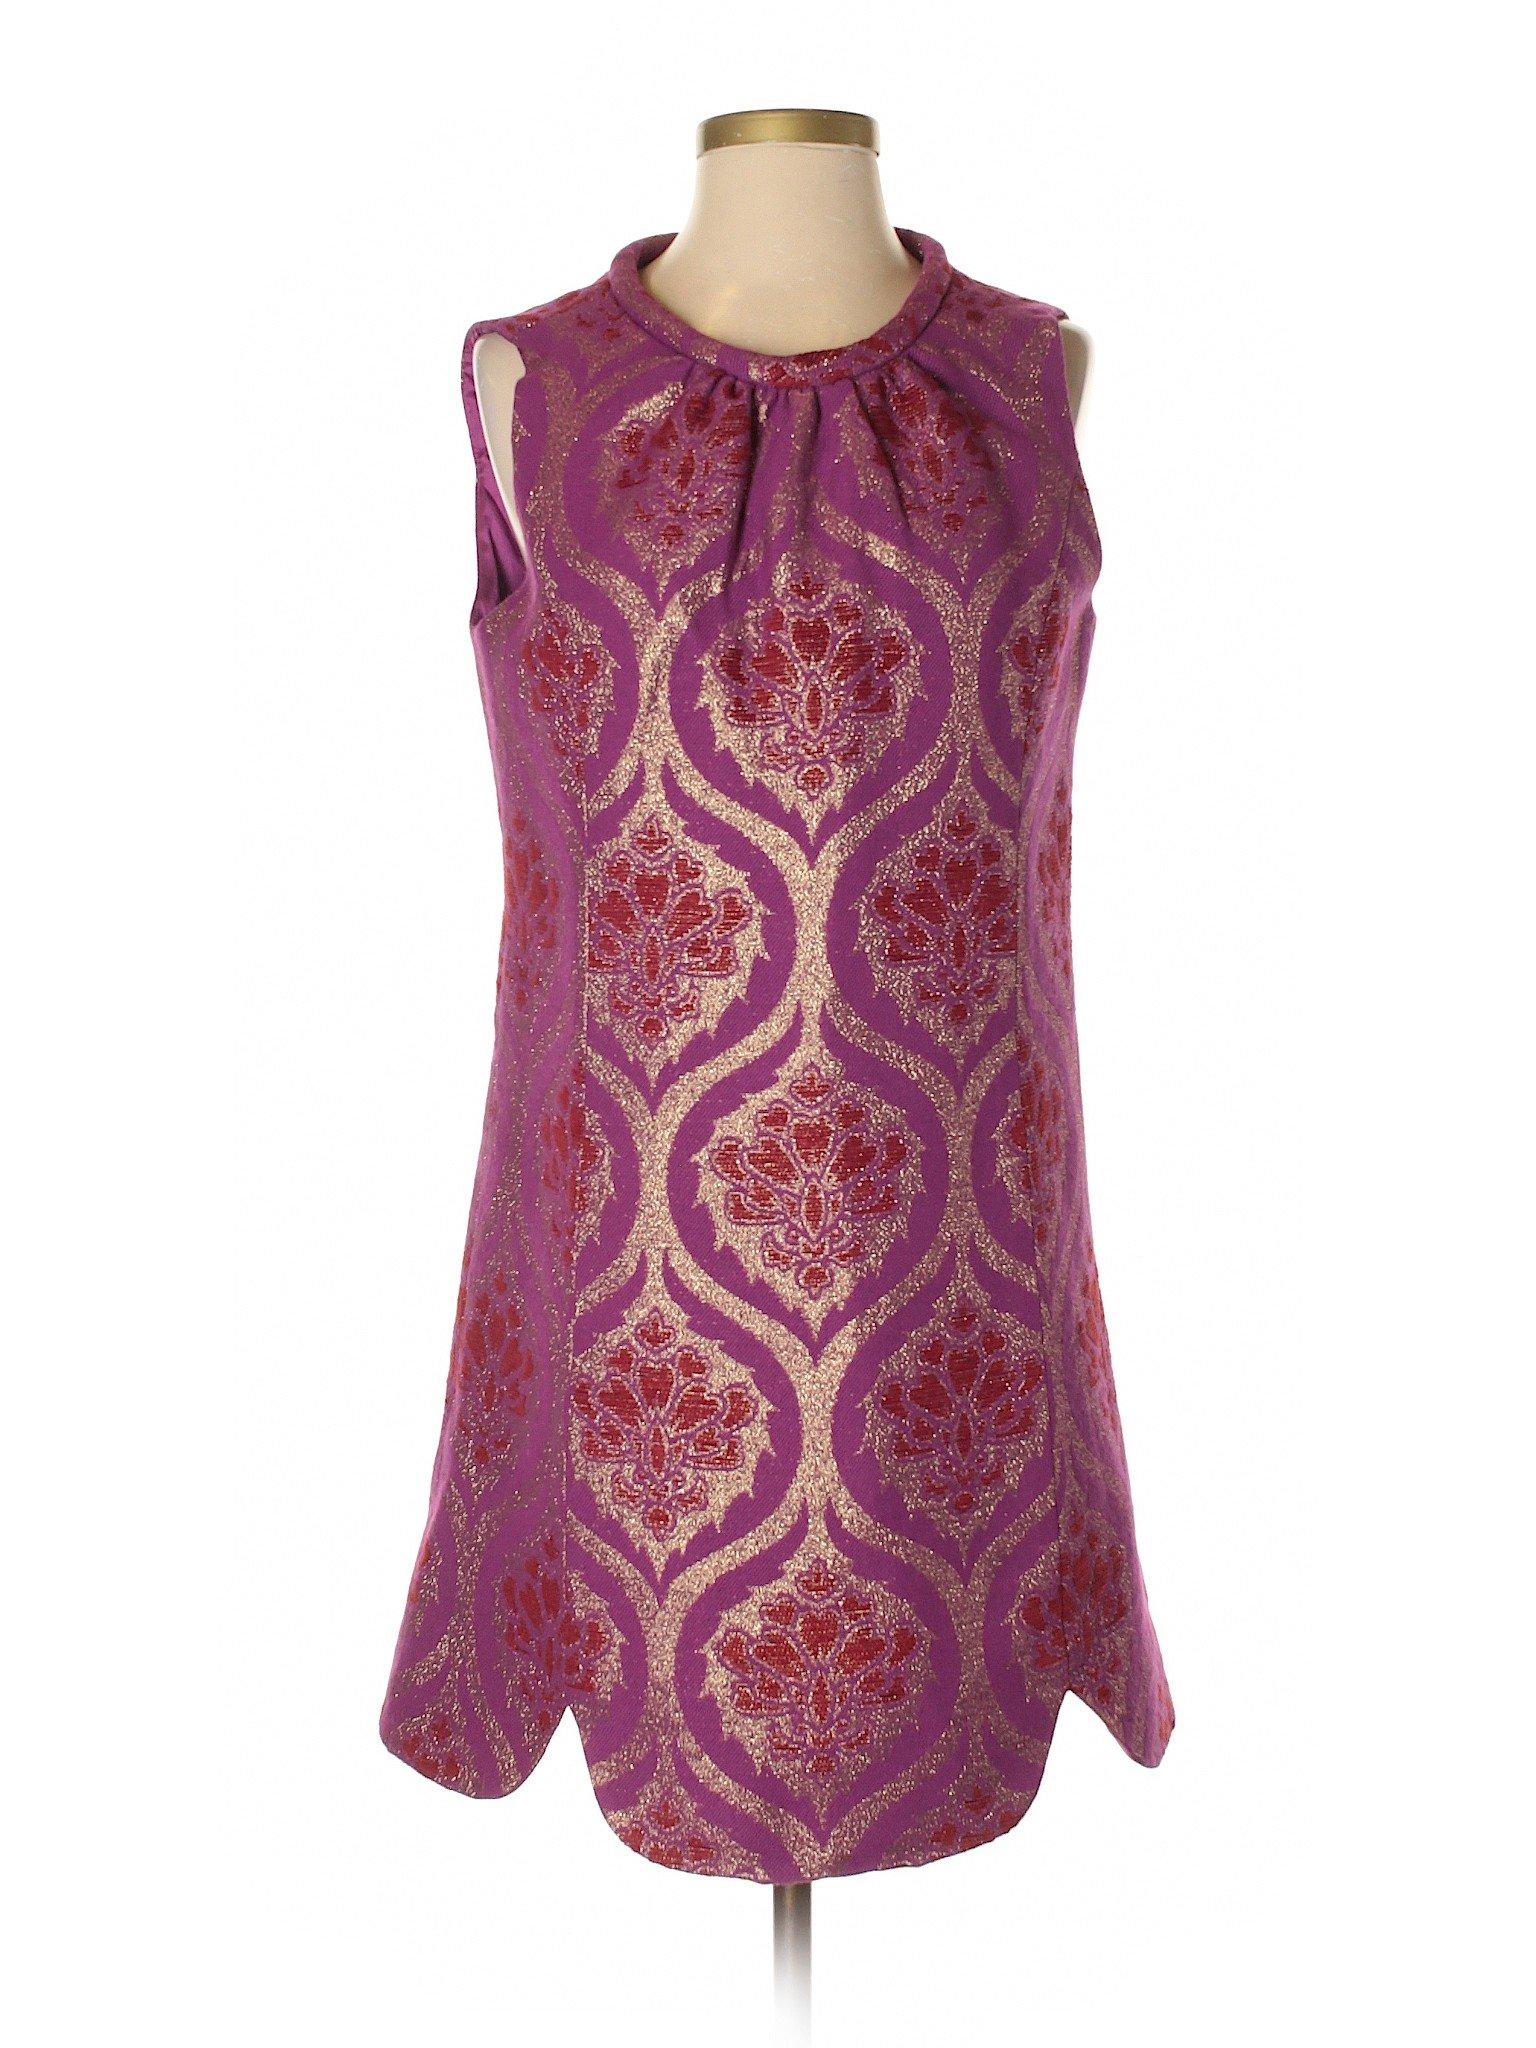 Anna Anna Casual Sui Dress Anna Dress Selling Casual Selling Selling Sui EqT1yTc